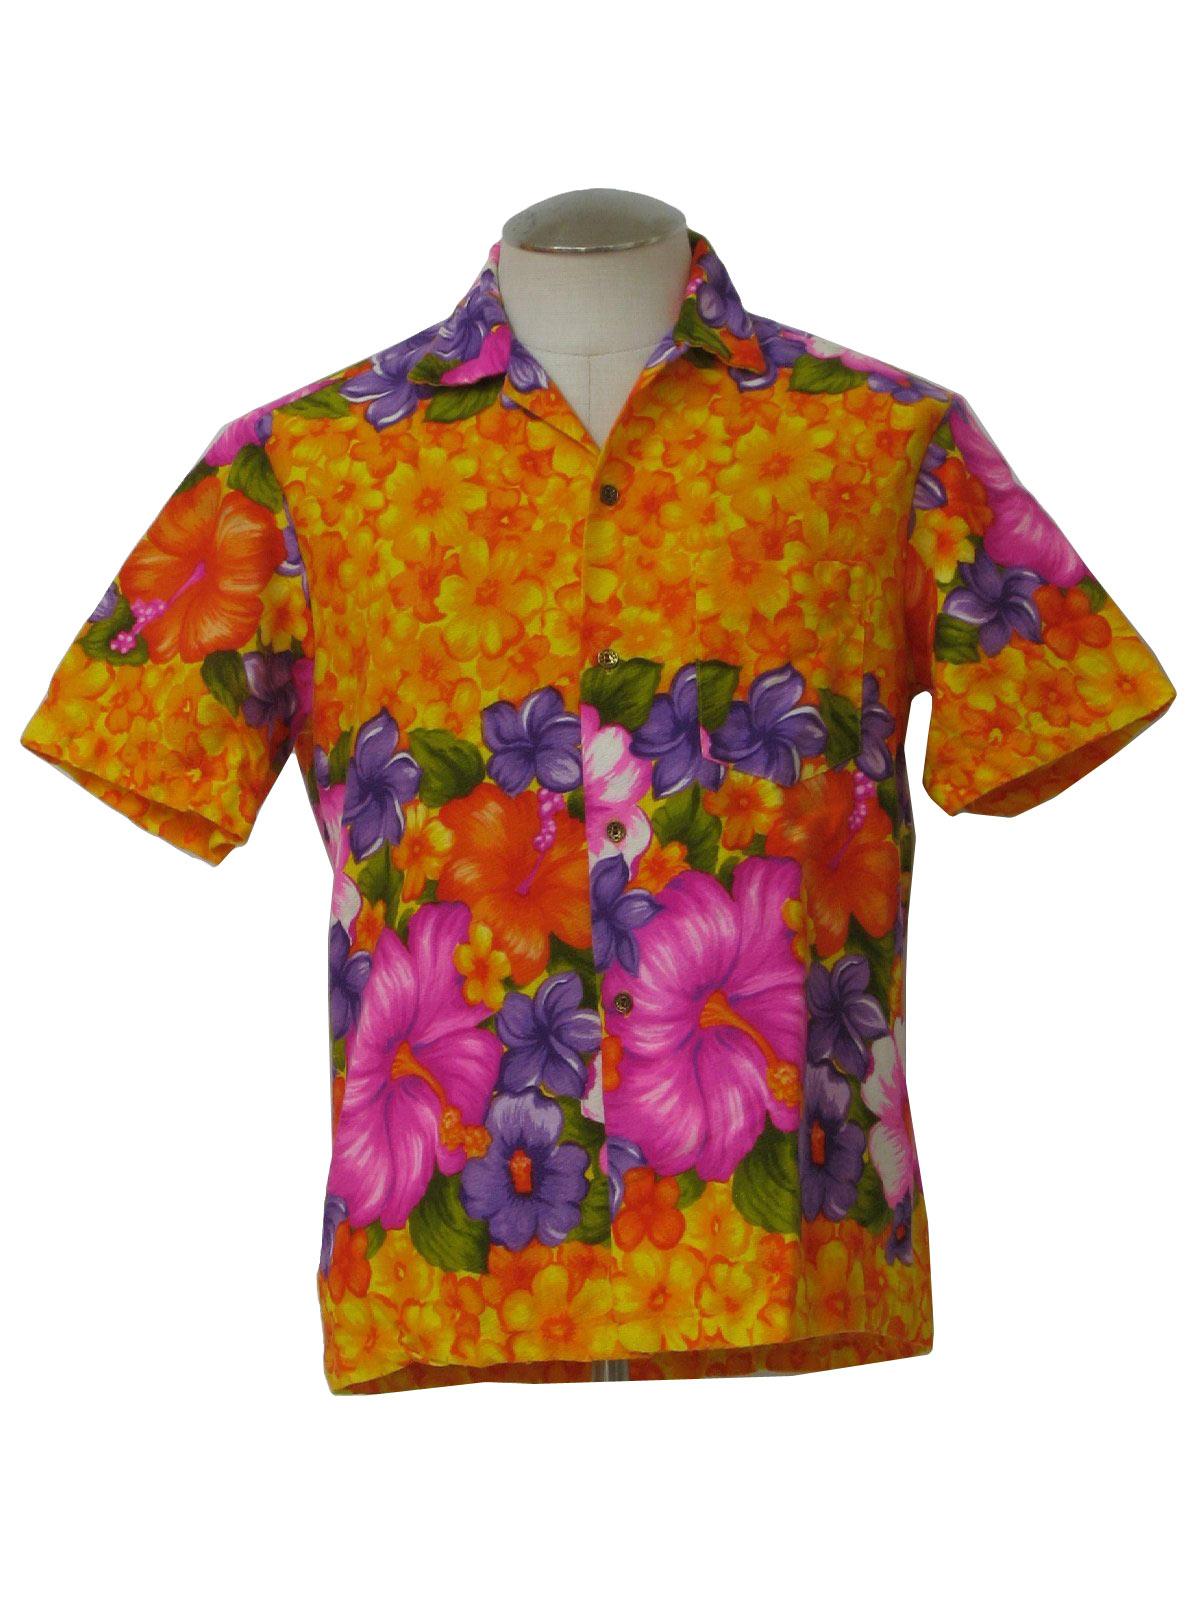 Vintage 1960's Hawaiian Shirt: 60s -Hawaiian Togs- Mens bright ...